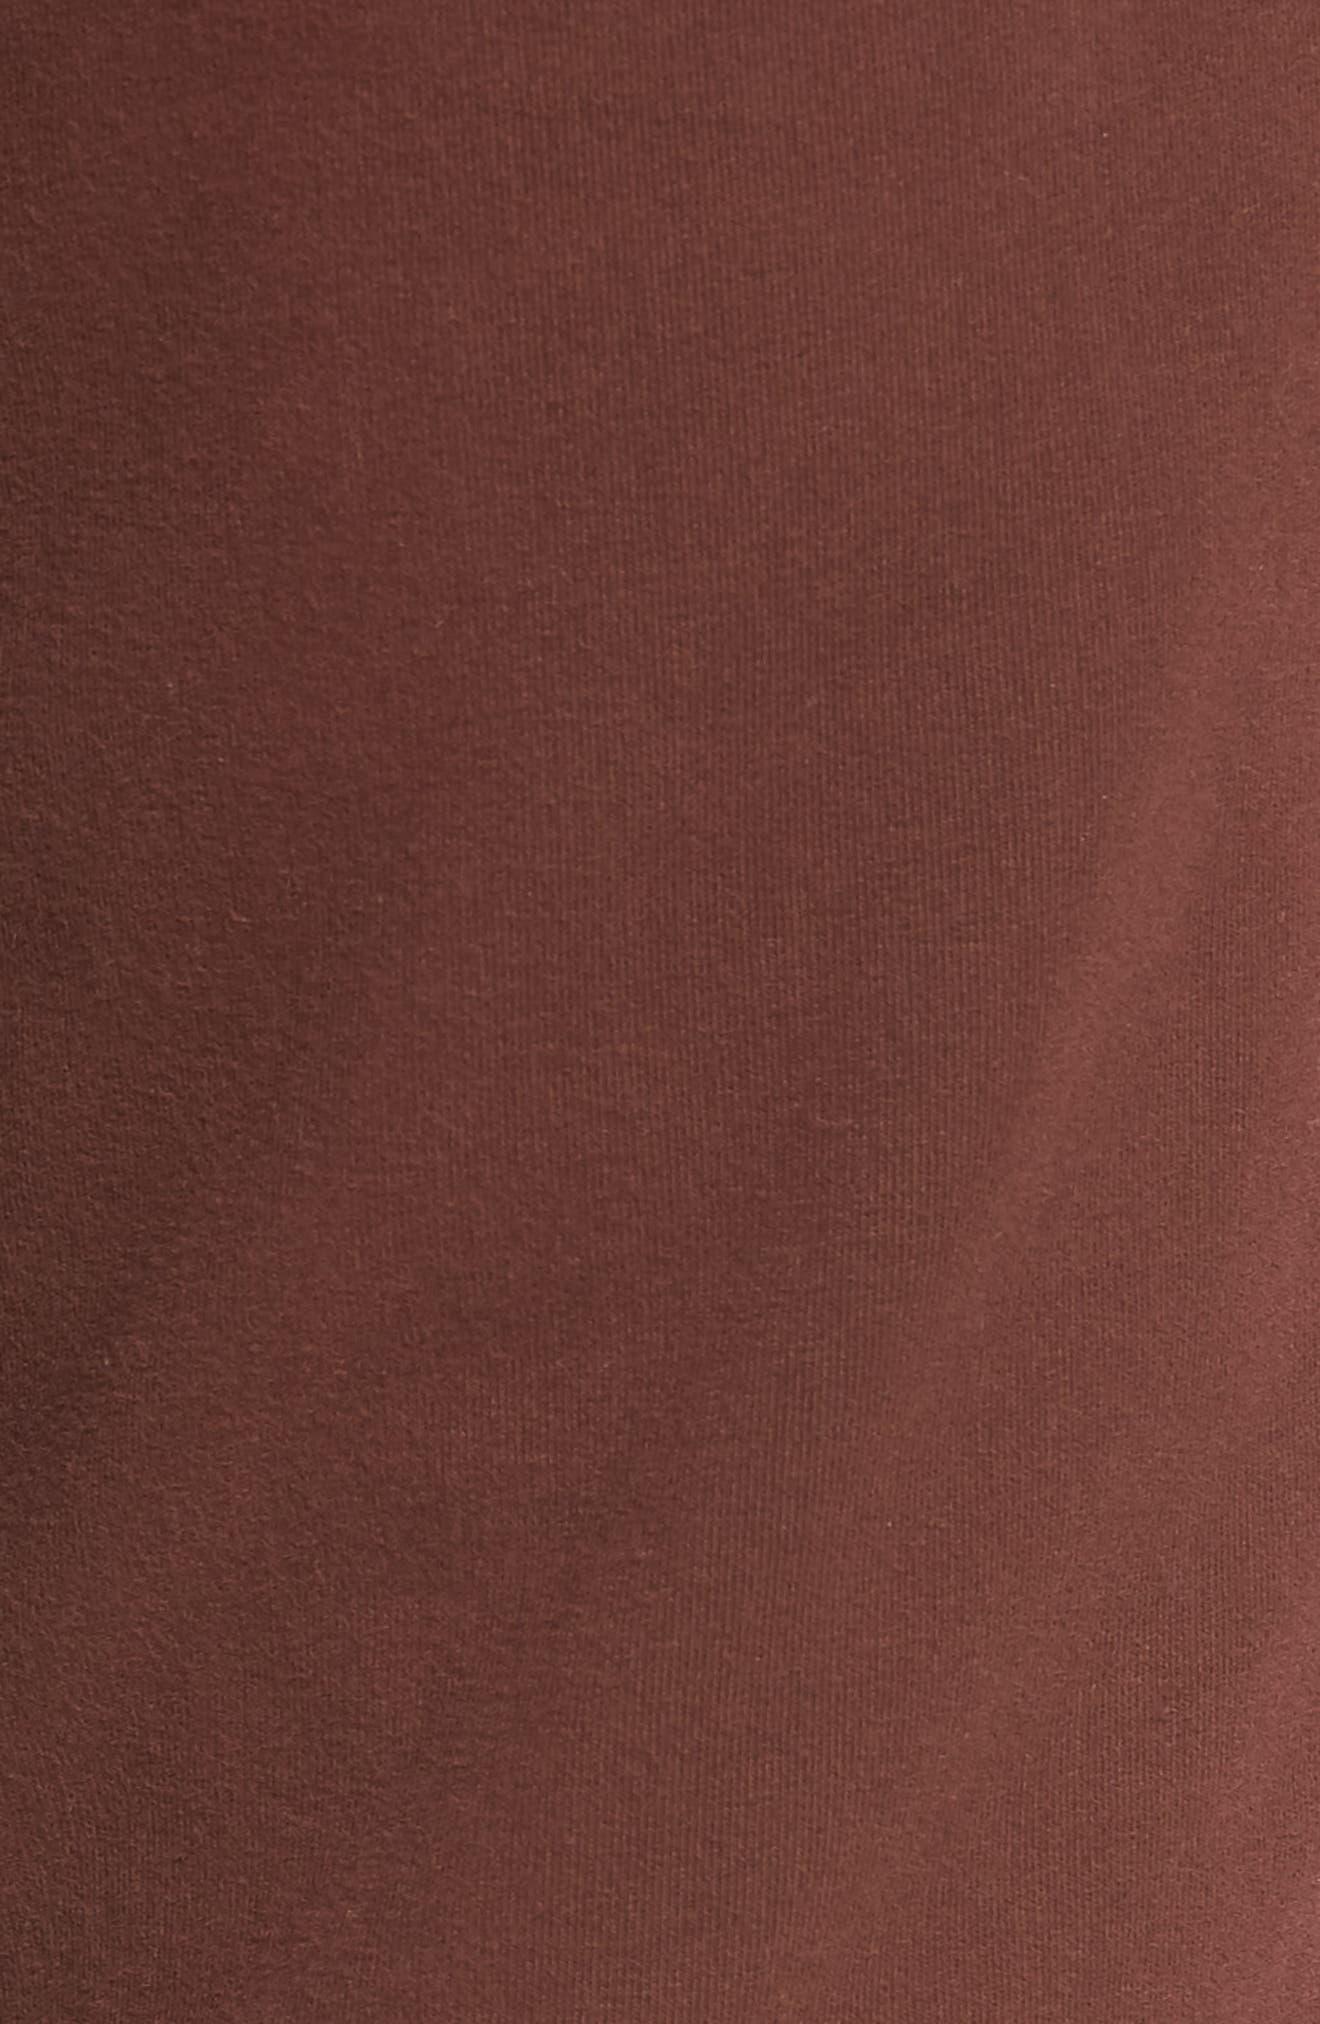 Slim Fit Sweatpants,                             Alternate thumbnail 5, color,                             930